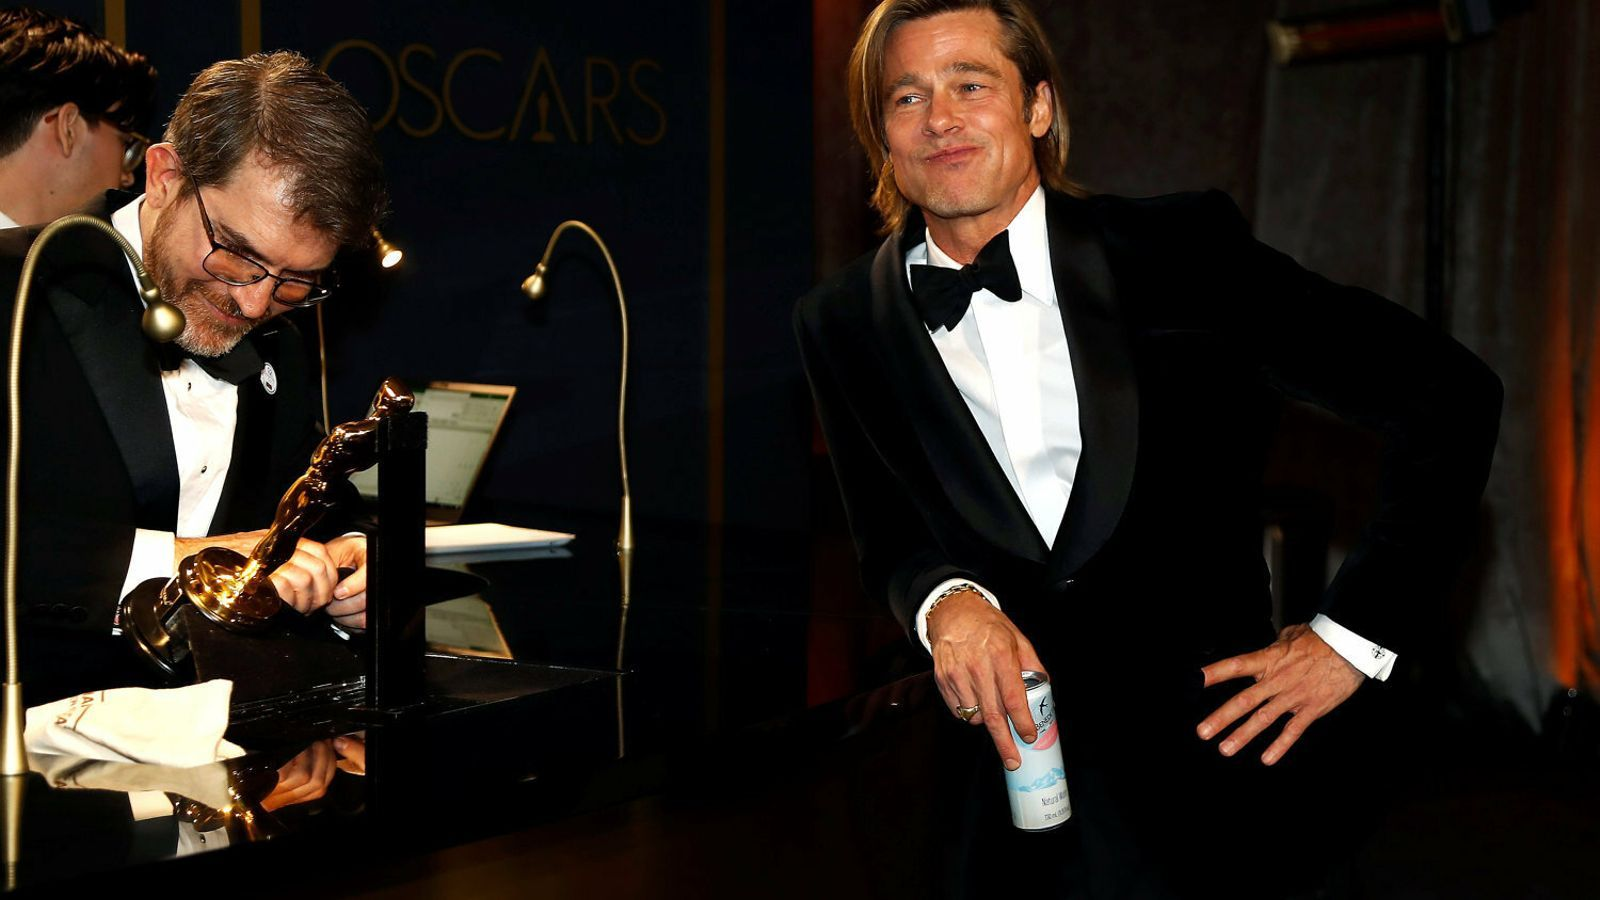 Brad Pitt No Longer Hides The Relationship With Model Nicole Poturalski